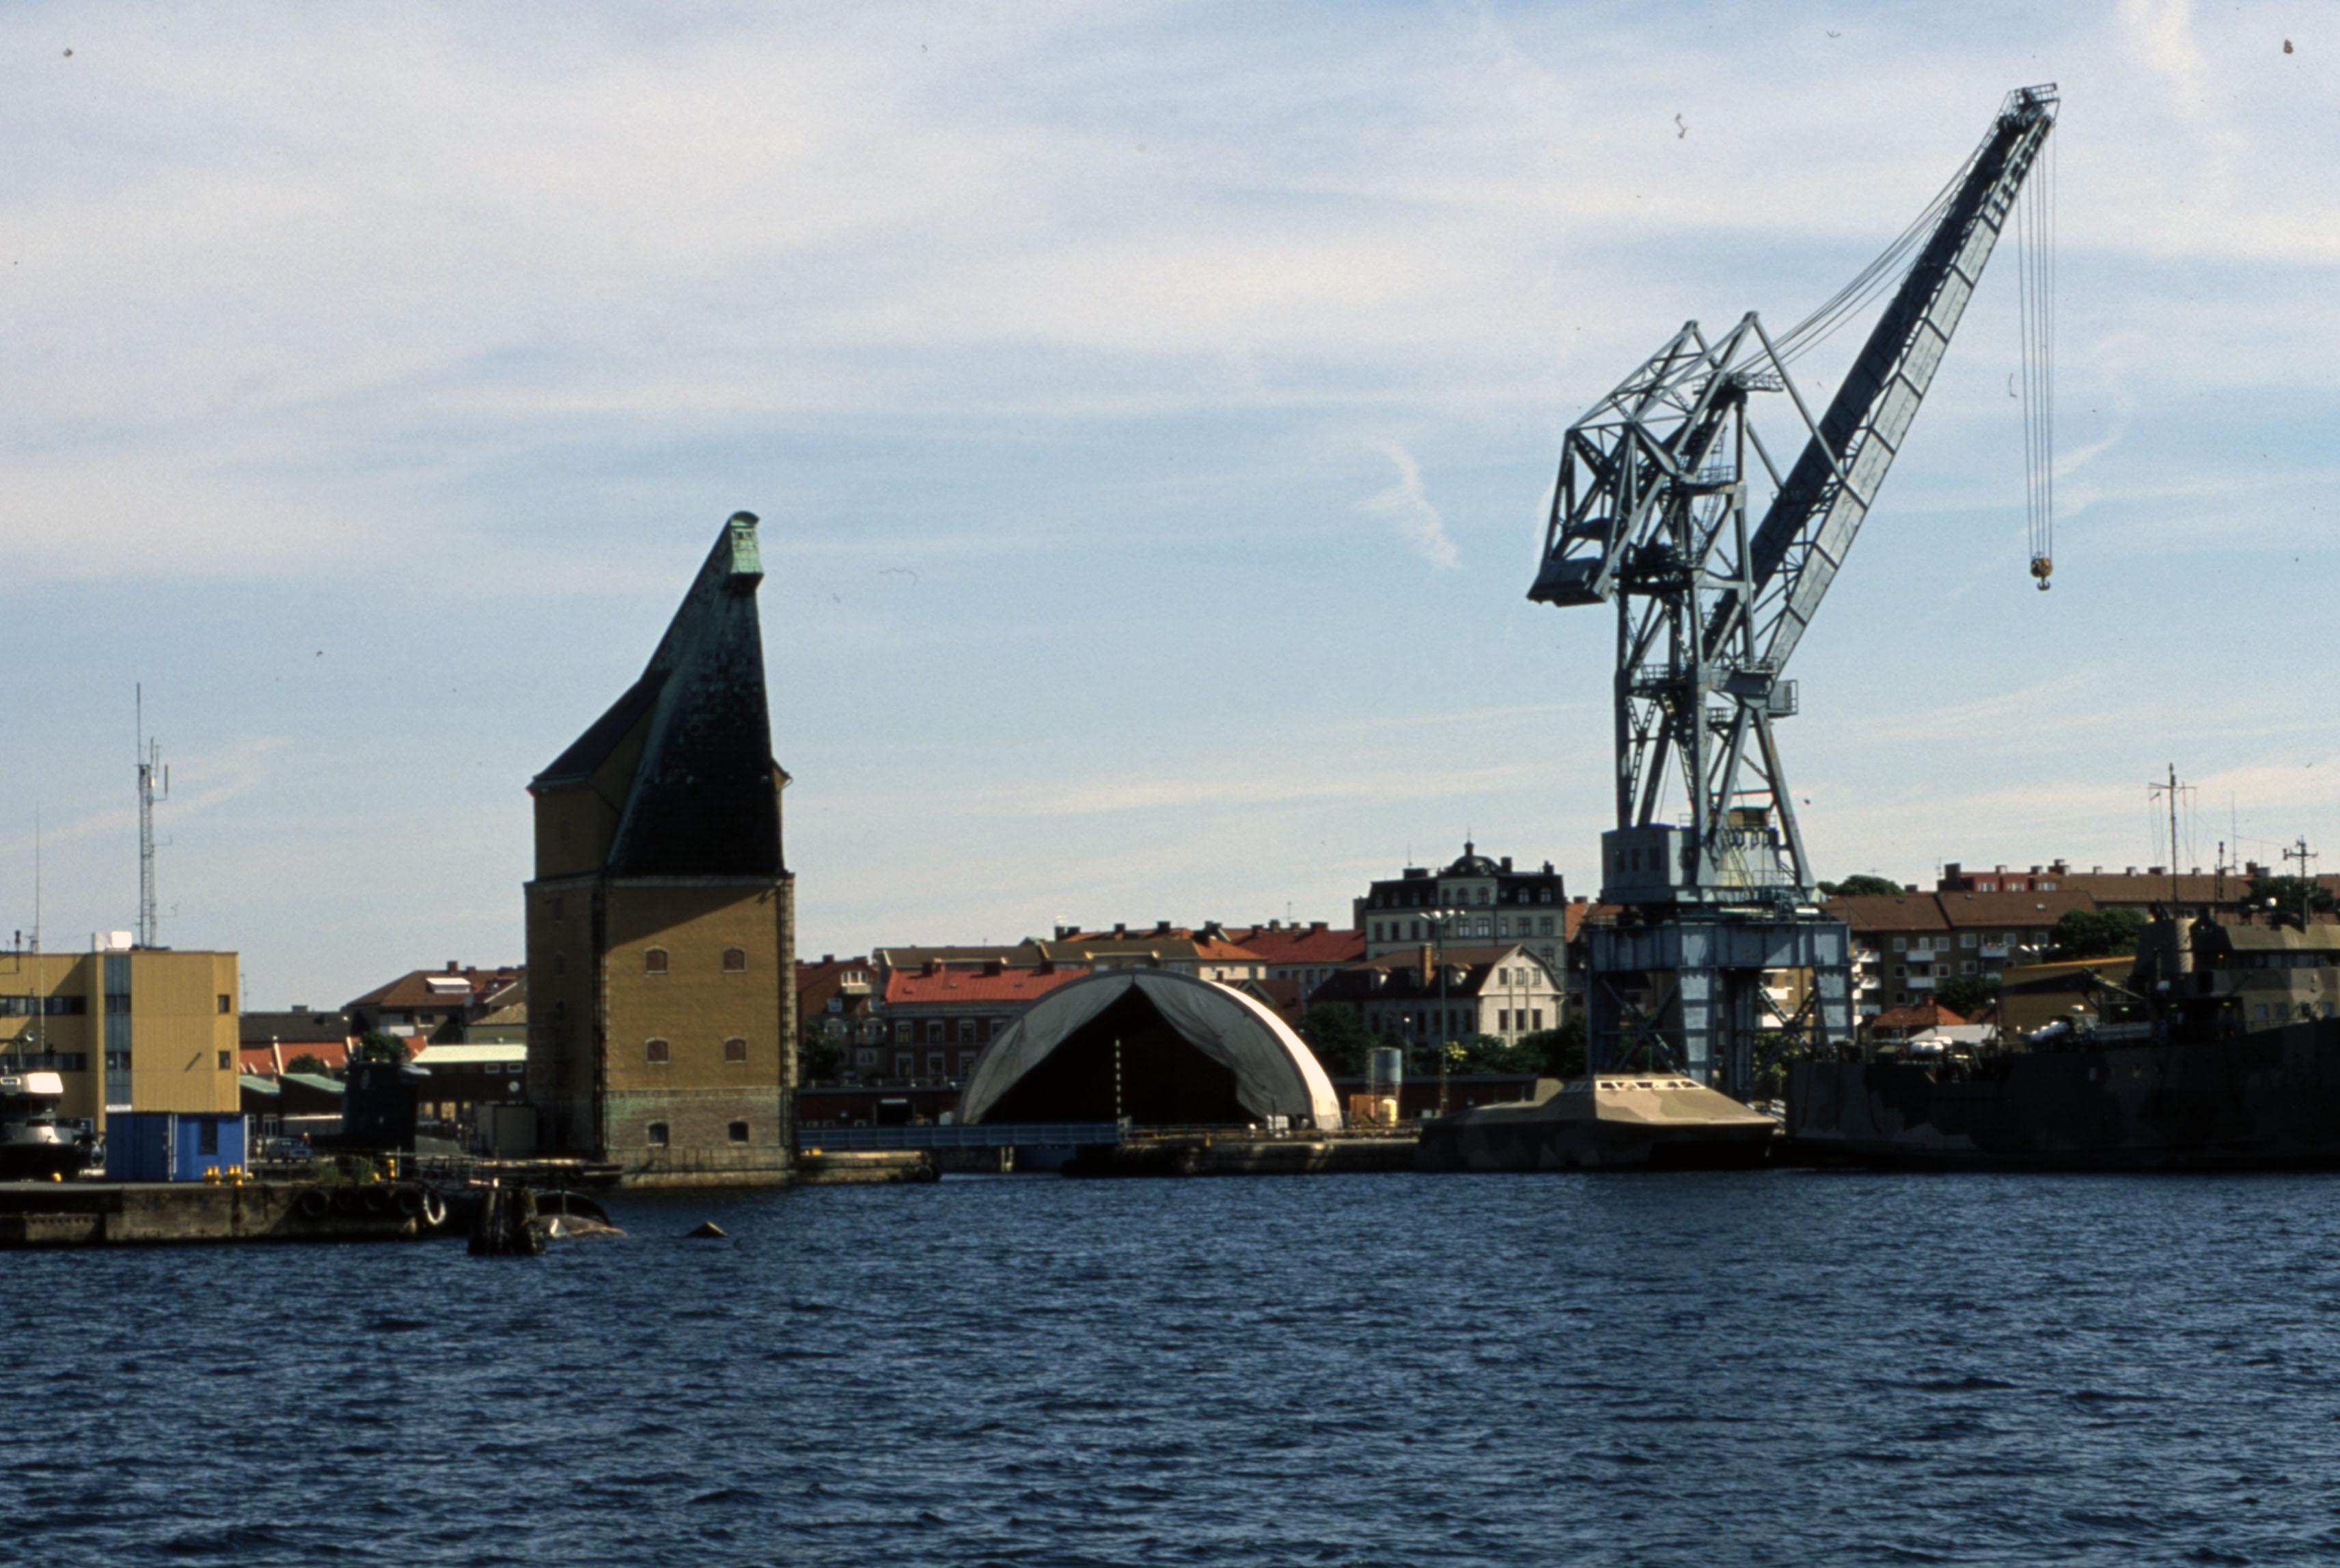 Gamla och nya mastkranen på varvet i Karlskrona. Blekinge Museum, Region Blekinges samling